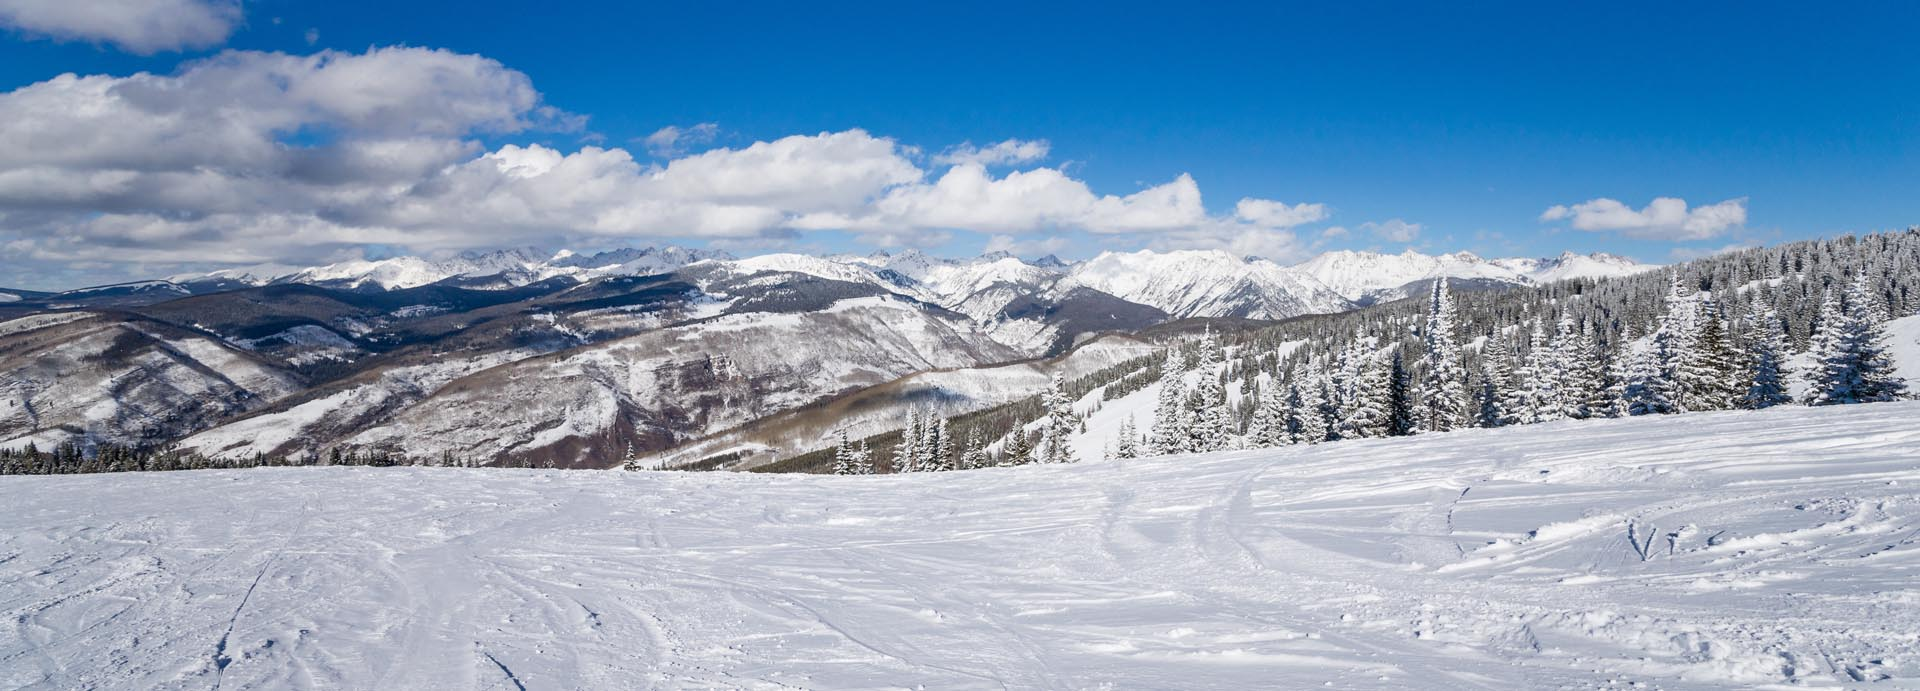 white snow mountains at VRI's Aspen at Streamside in Colorado.